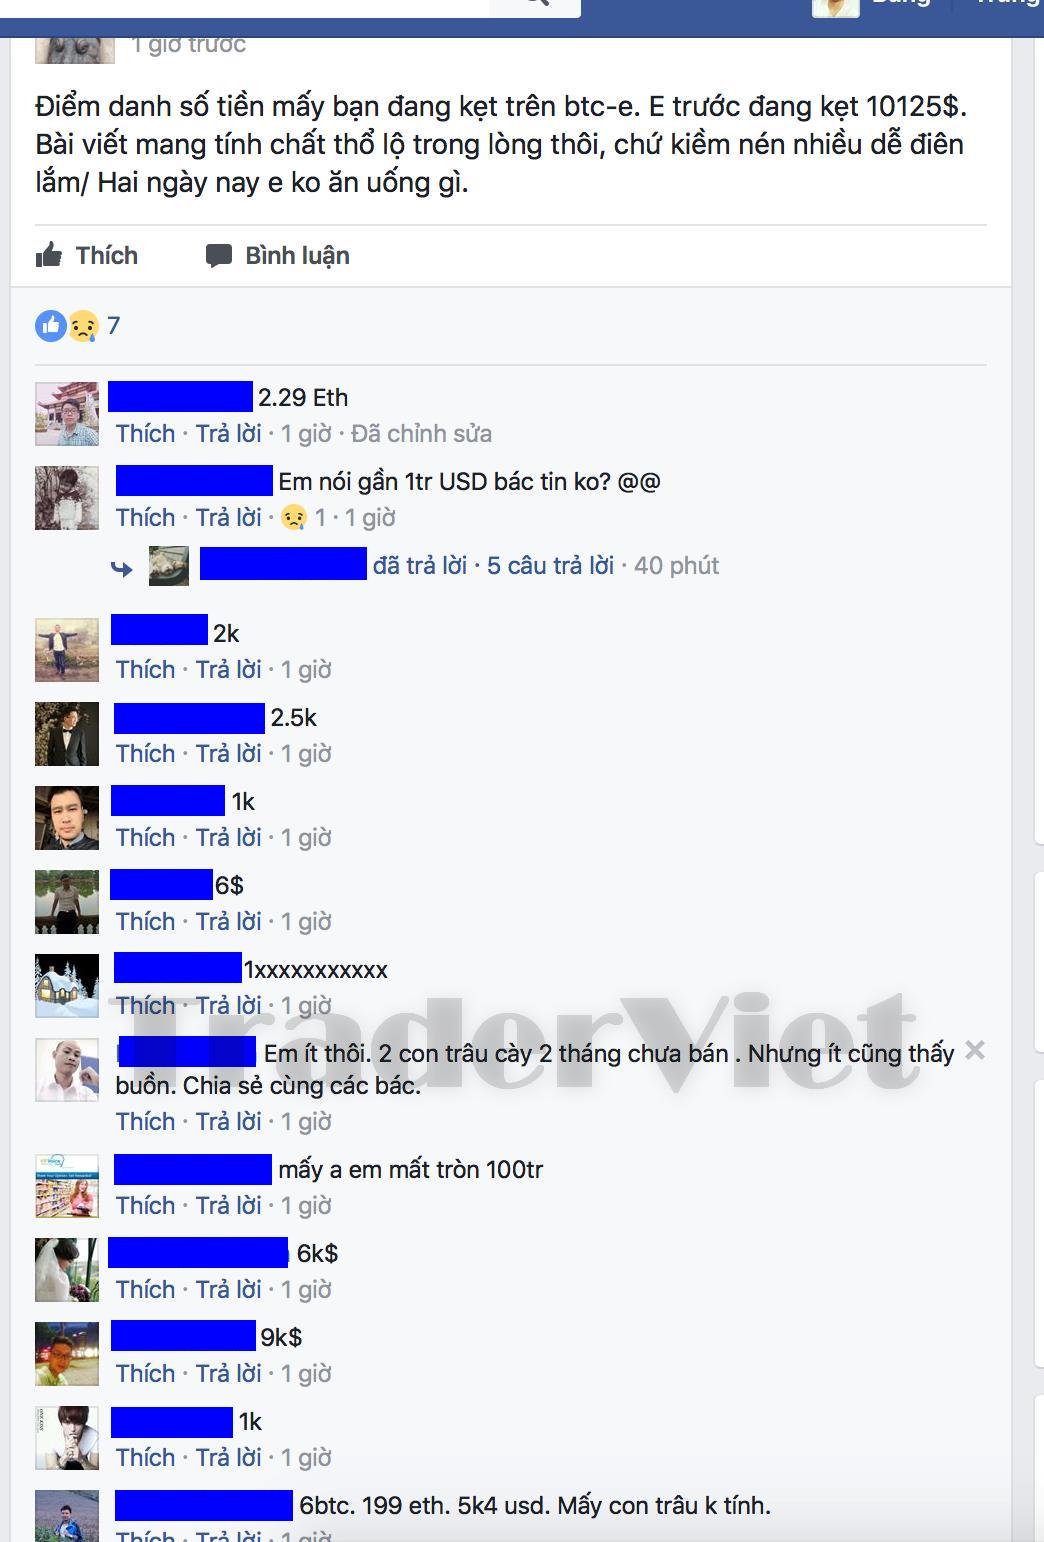 bitcoin-trader-viet-nam-traderviet-1.PNG